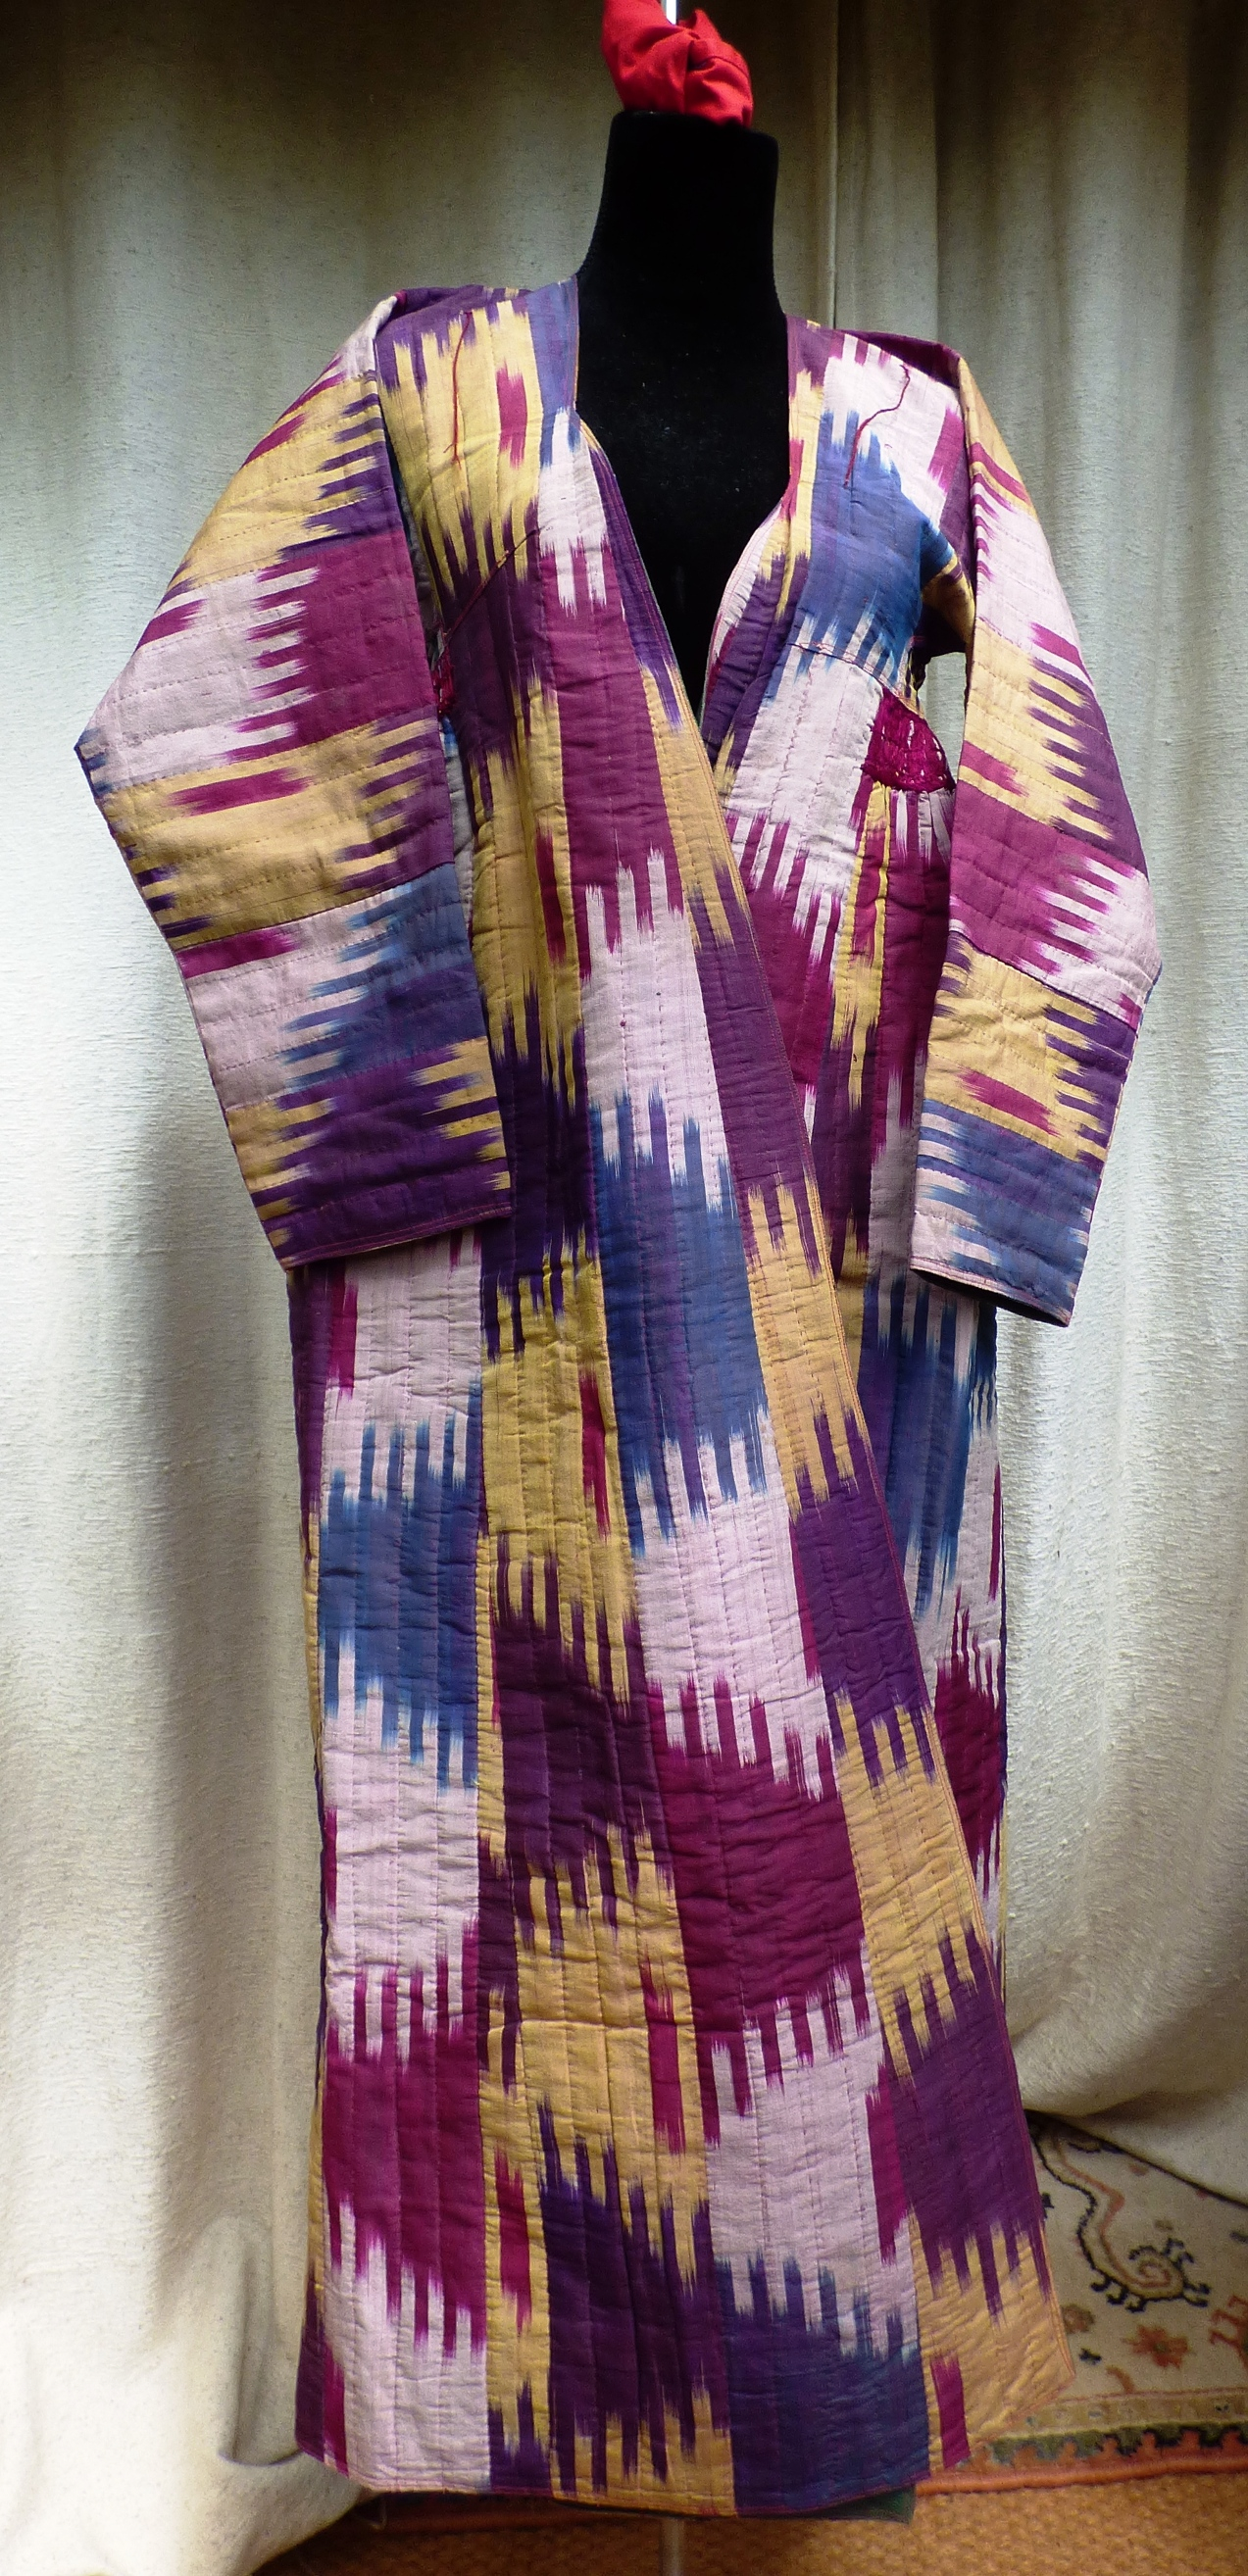 Vintage Chapan Central Asian Ikat Woven Robe 17080